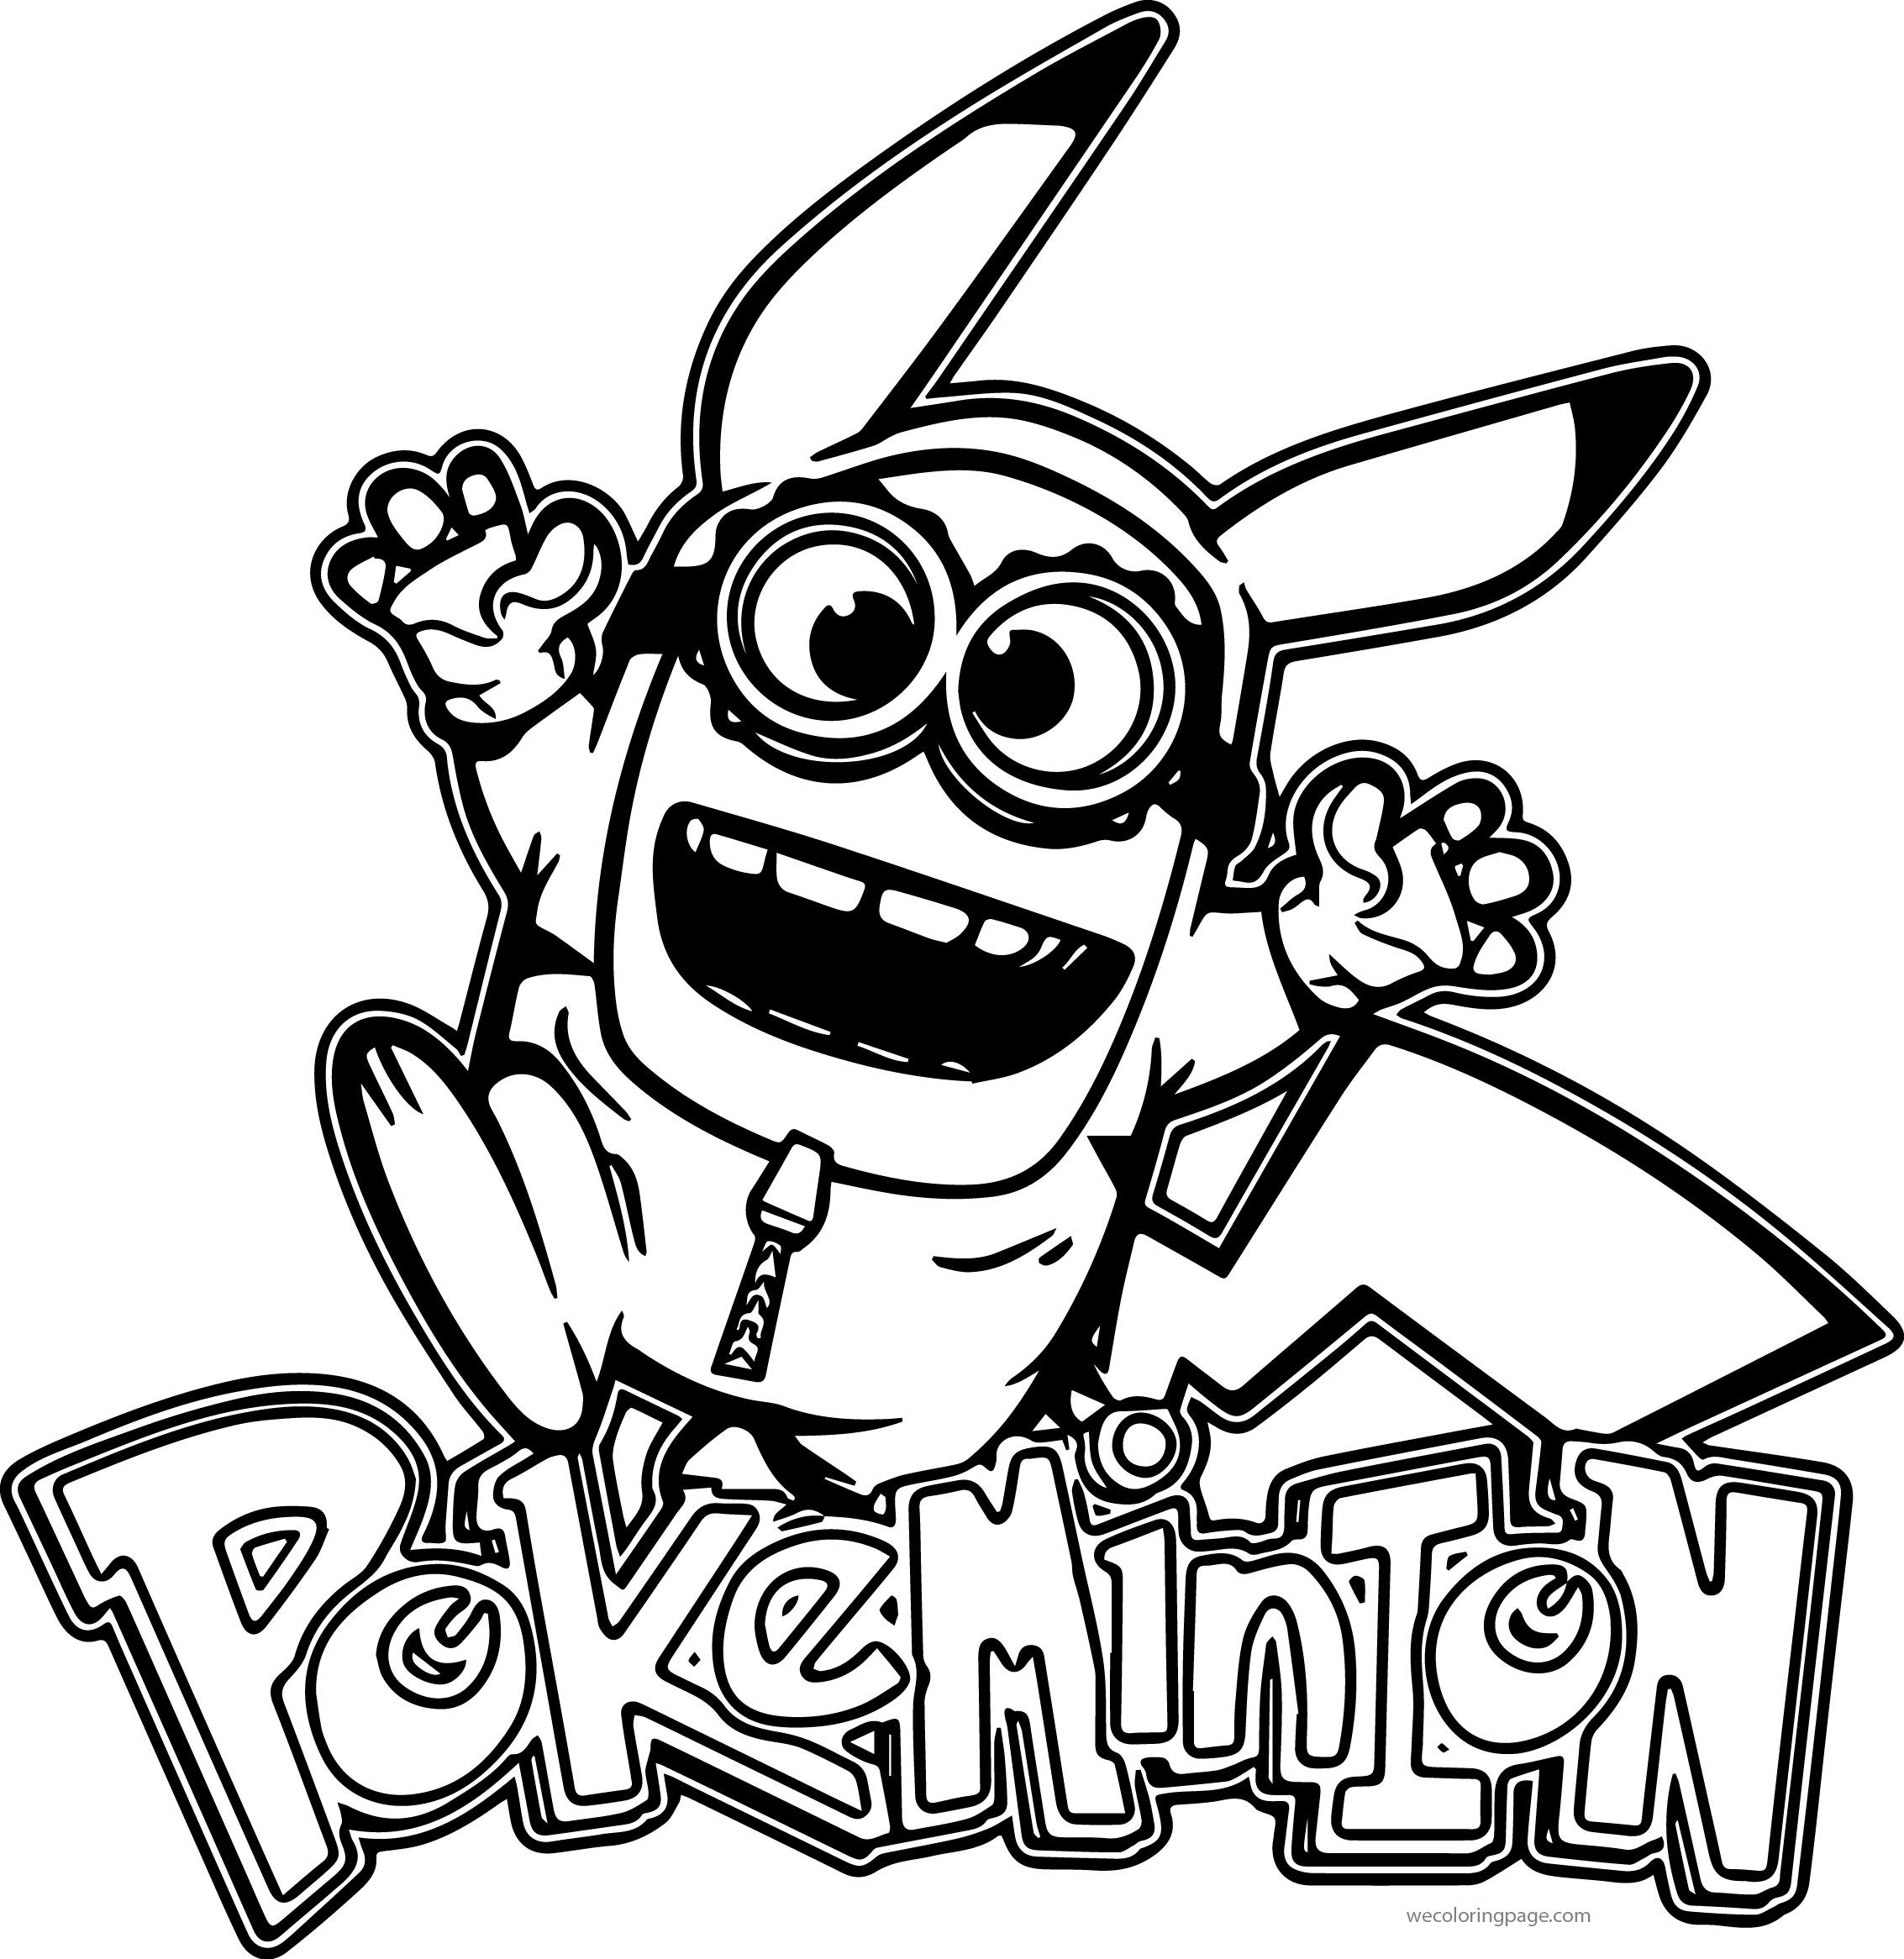 Minion Pikachu Pokemon Coloring Page 02 | Pikachu coloring ...